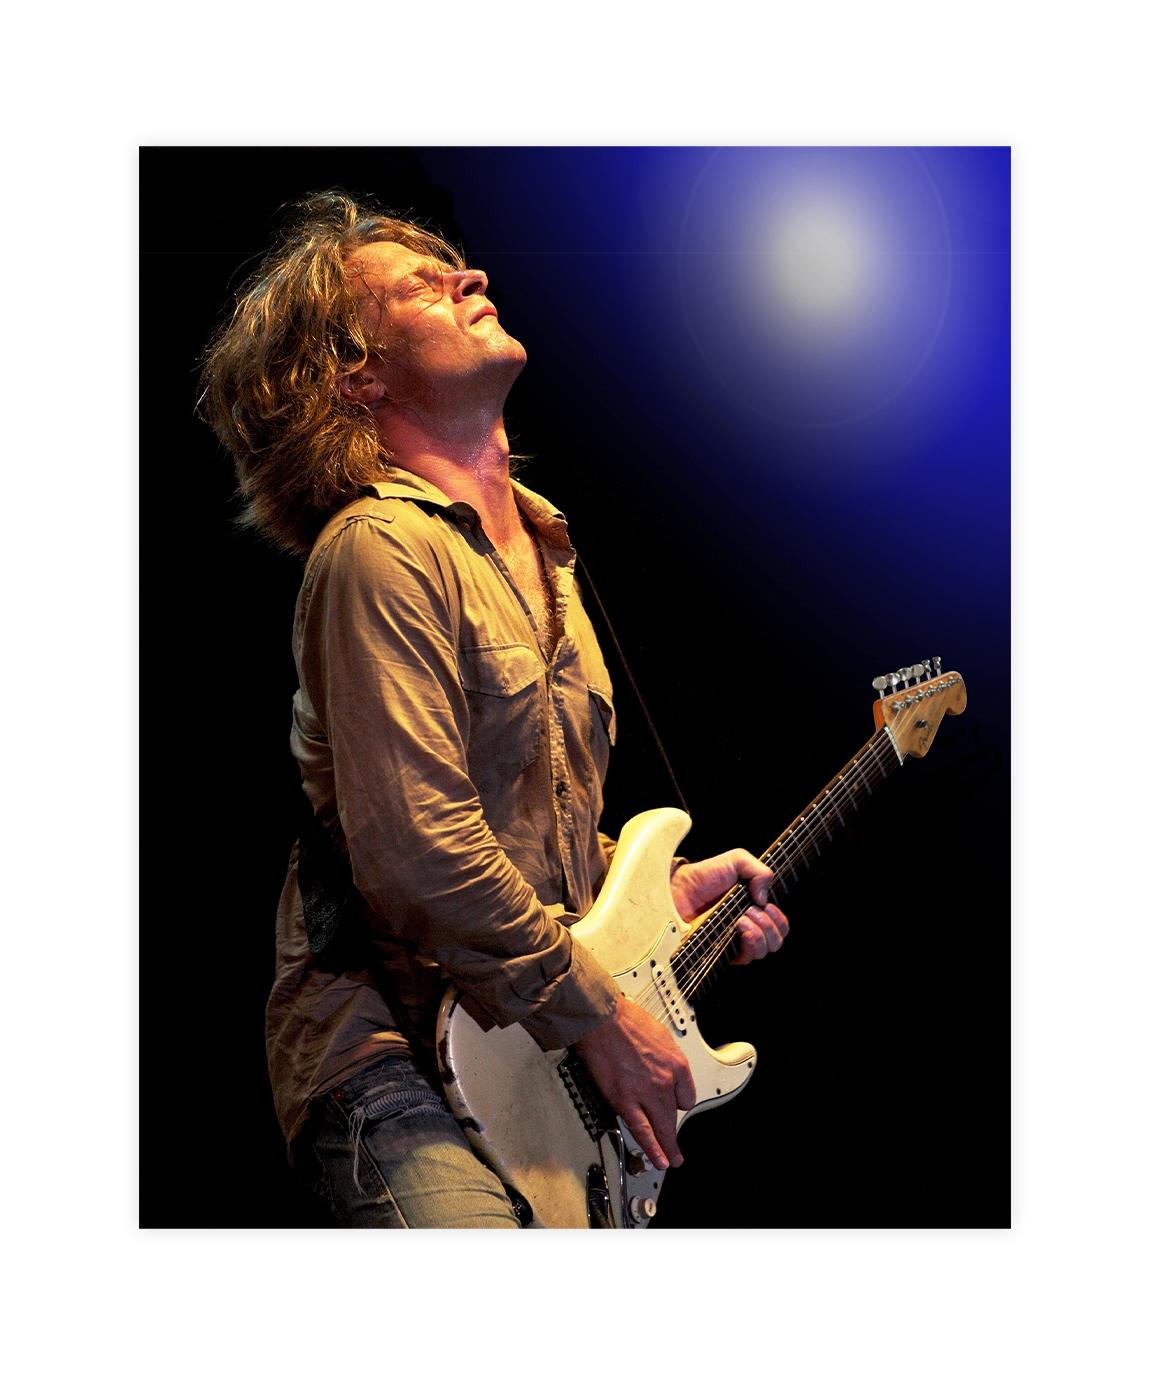 Thomas_Blug_on_the_guitar